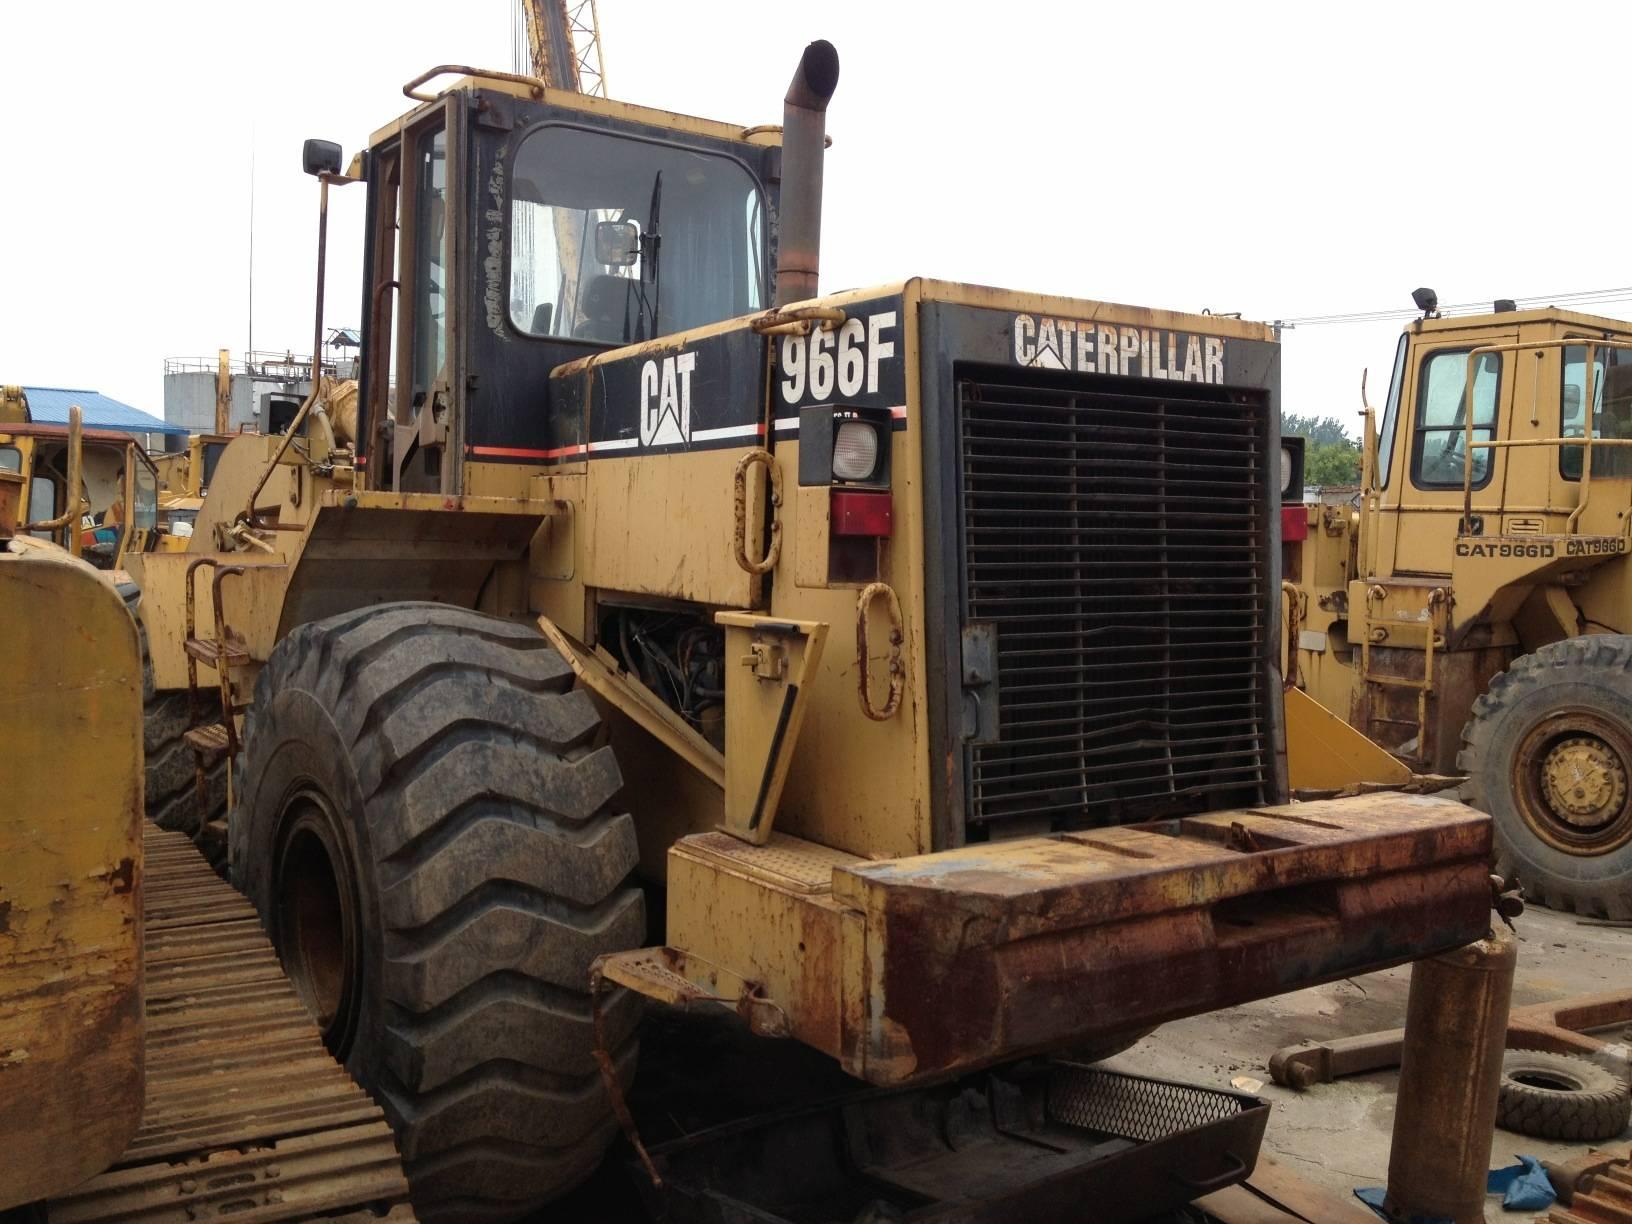 Used Cat 966F-11 Wheel Loader, Used Loader Caterpillar 966F-11